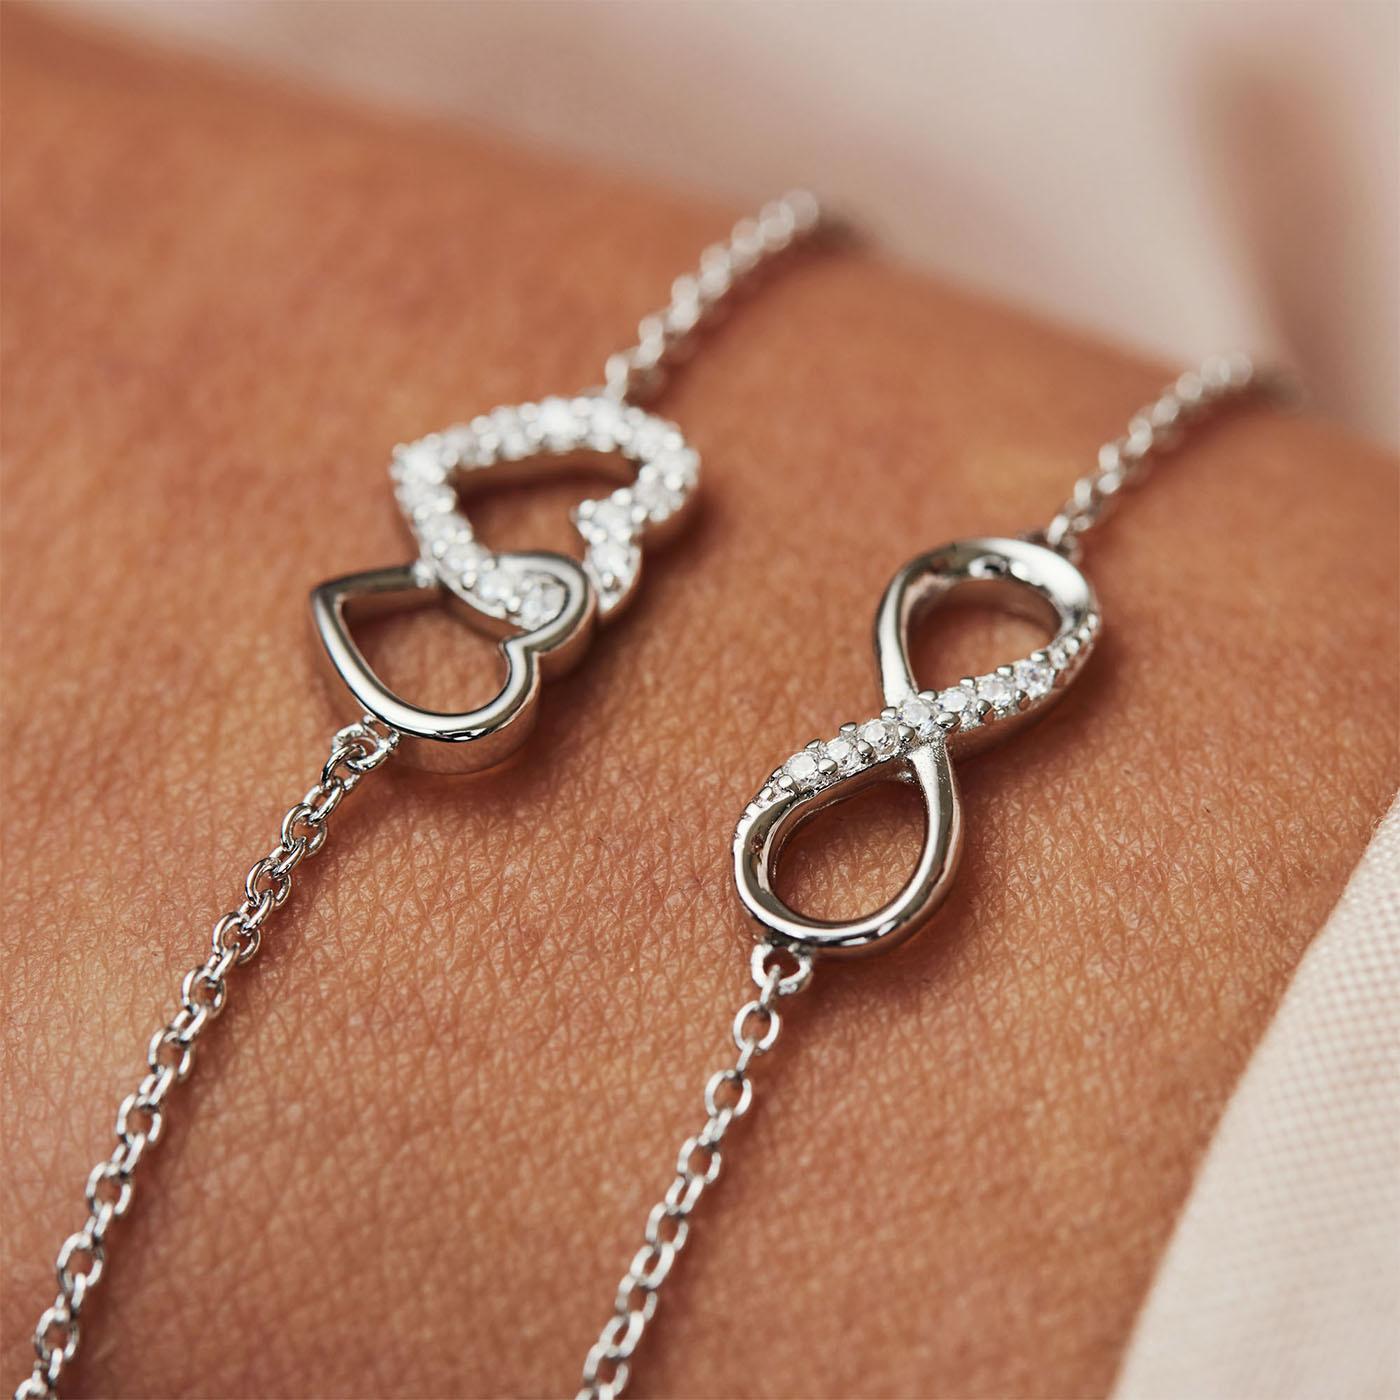 Selected Jewels Julie Emilie 925 Sterling Silber Unendlichkeit Armband